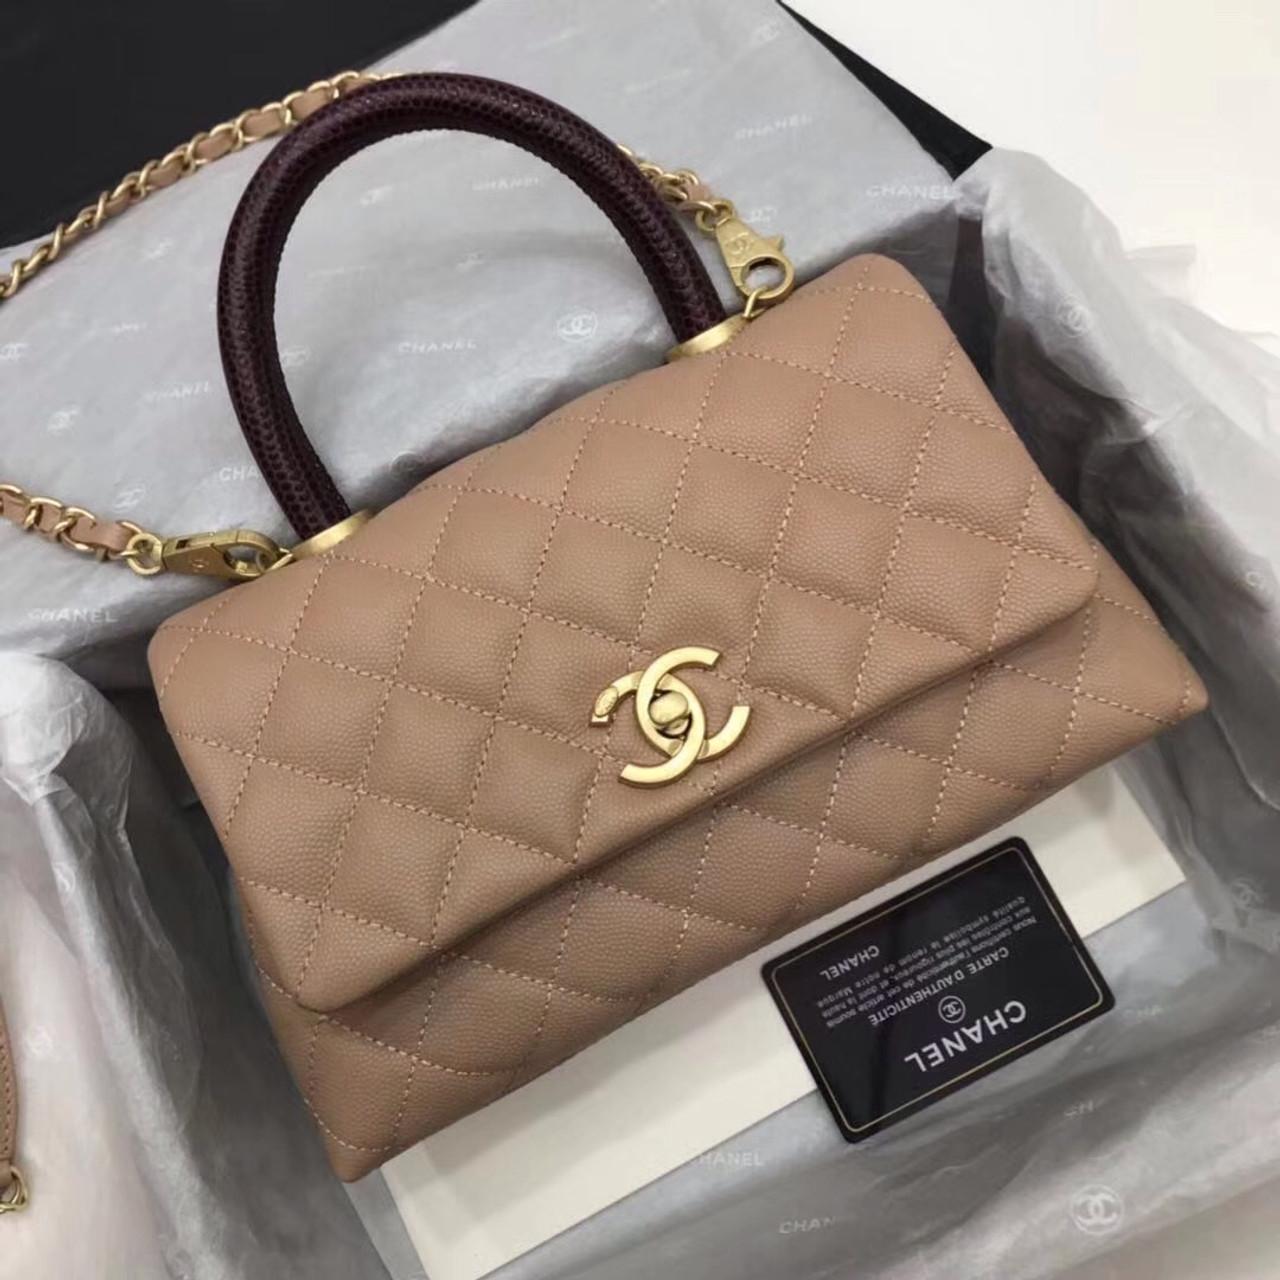 4e4d49a81b72ce Chanel Caramel Calfskin/Lizard Coco Medium Handle Bag - Bella Vita Moda